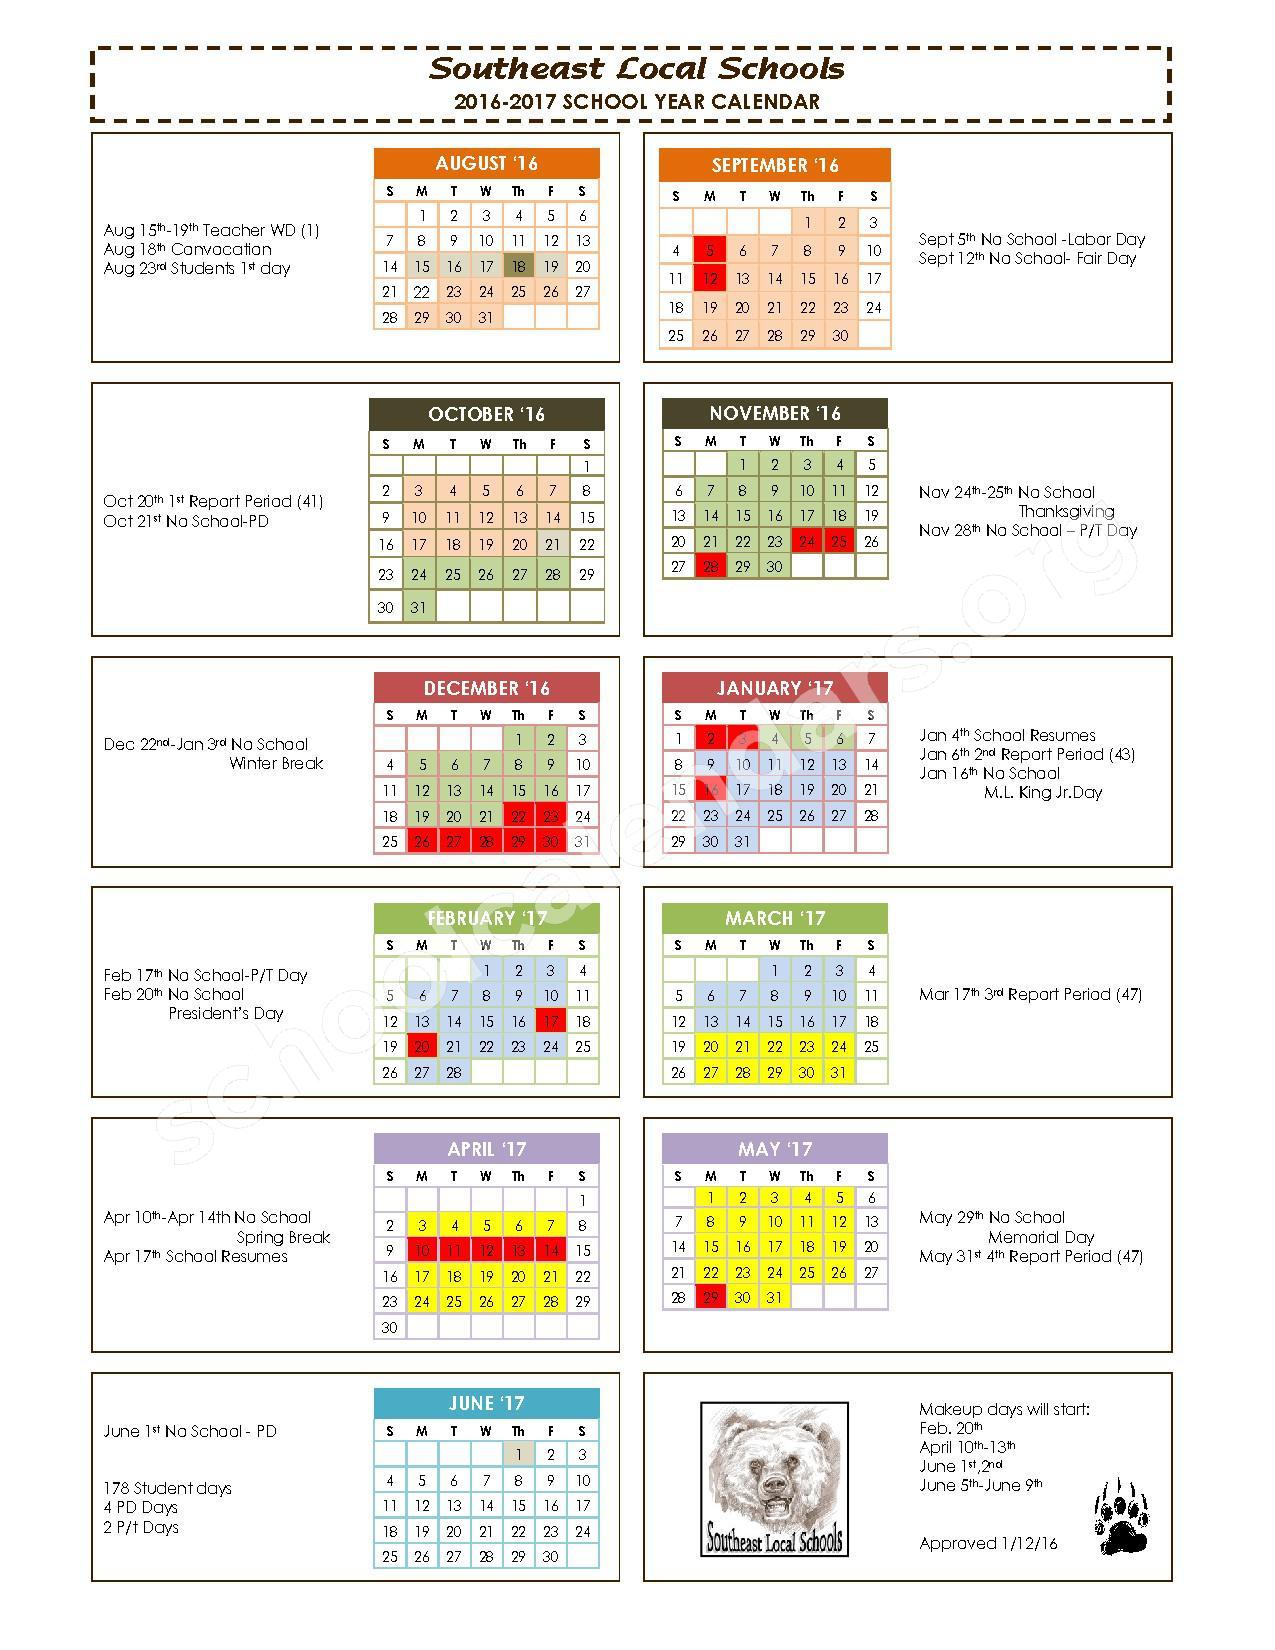 2016 - 2017 School Calendar – Southeast Local School District (Wayne County) – page 1